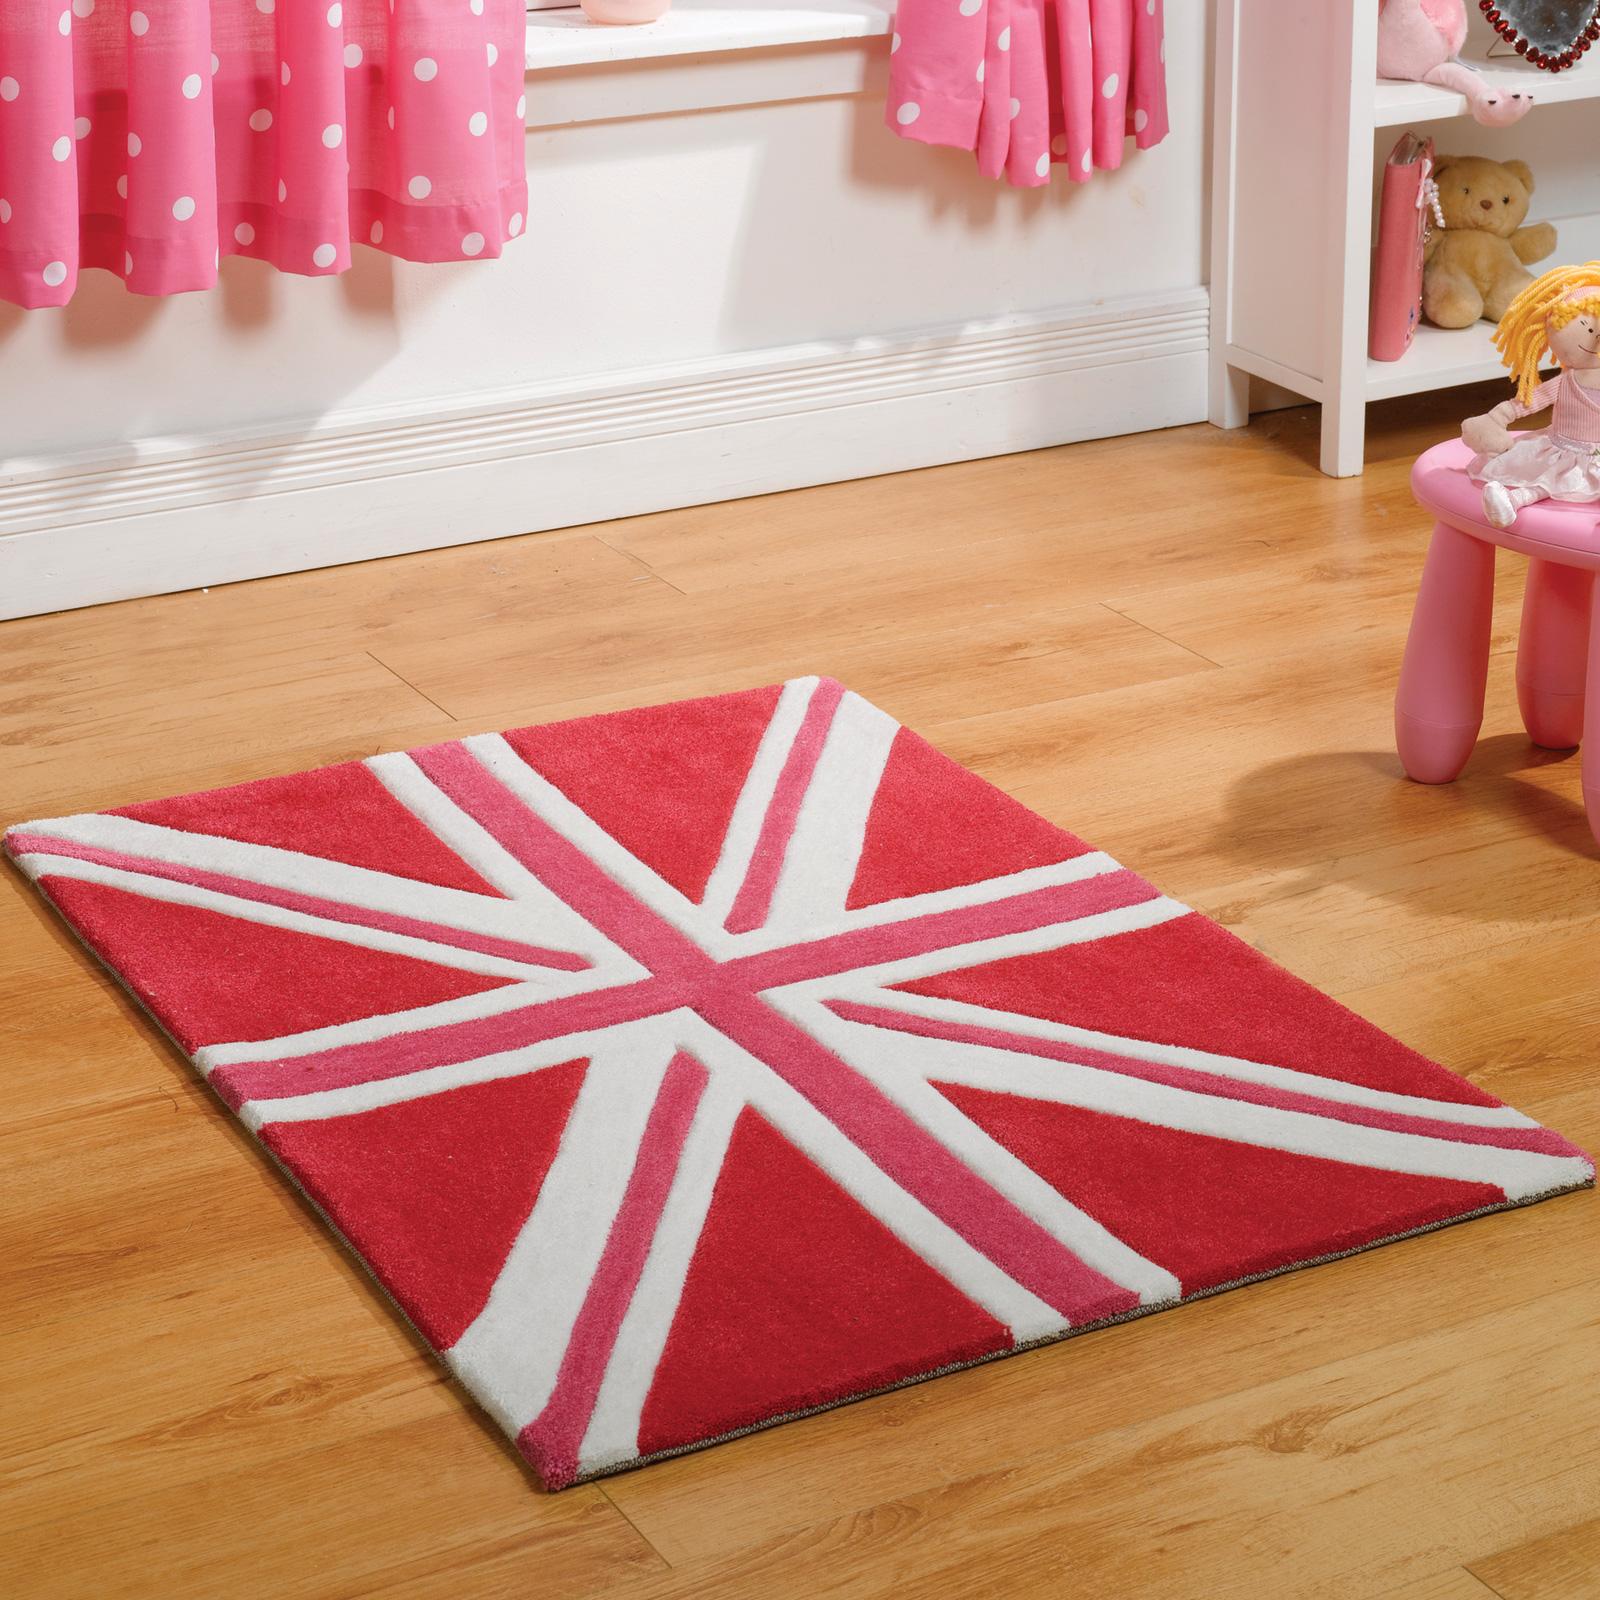 Children Playroom Fun Playful Kids Floor Carpet Rug For Childrens Bedroom